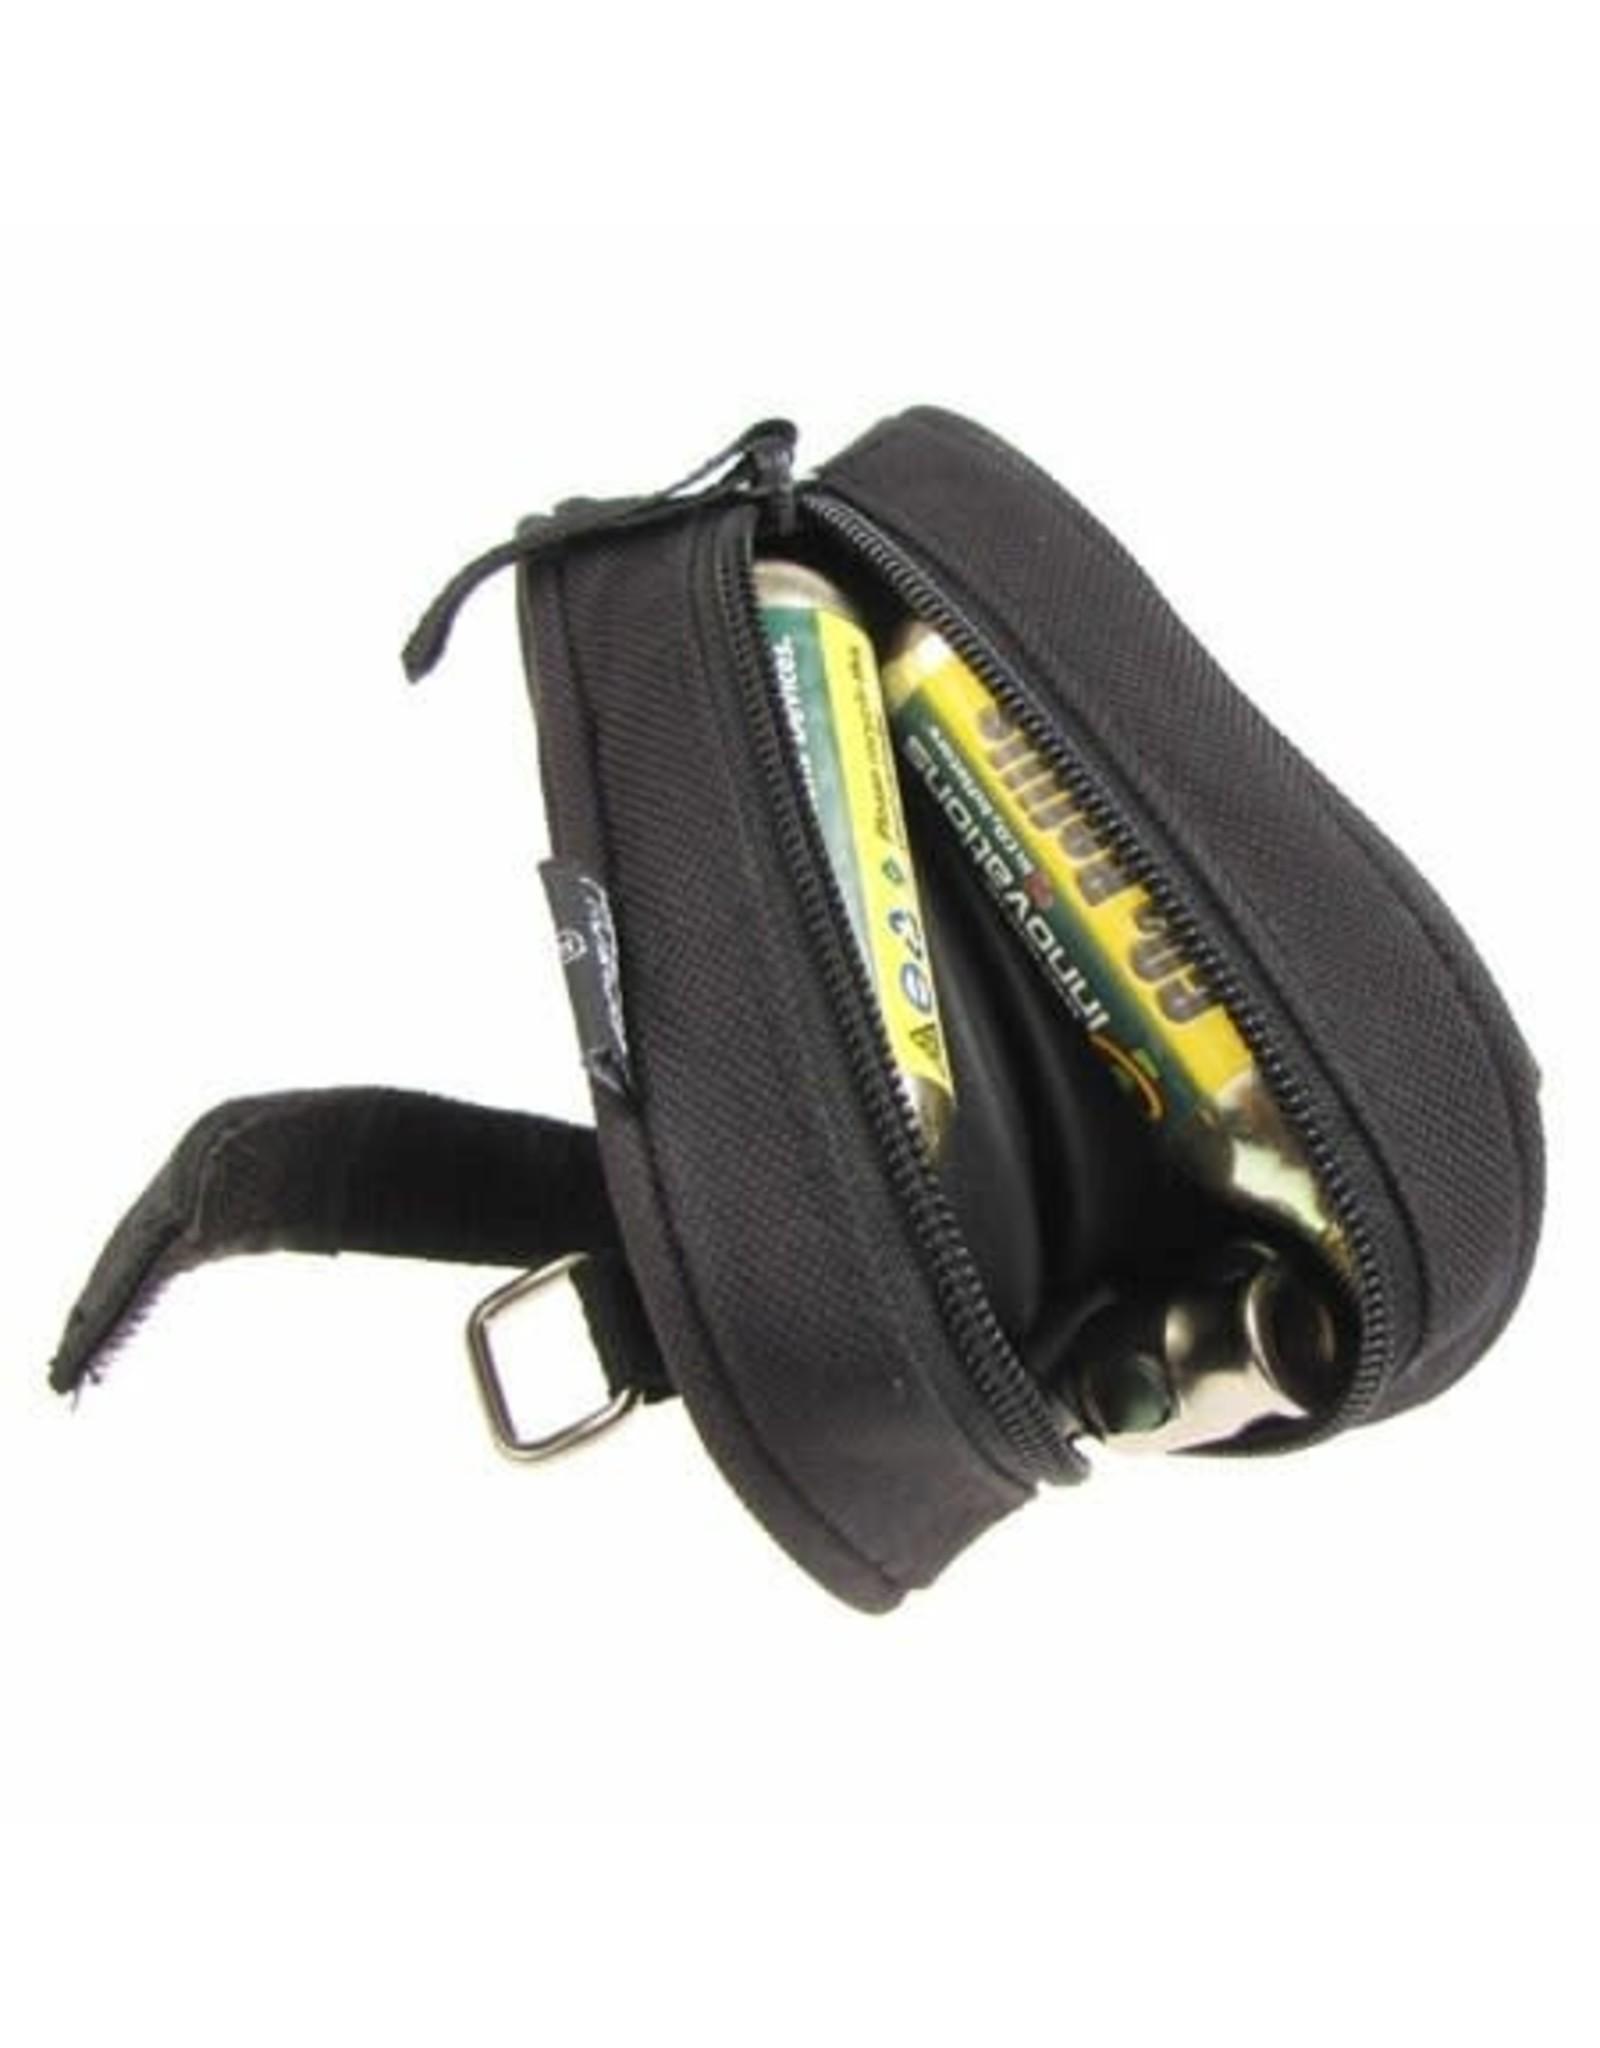 Arundel Arundel Dual Seat Bag